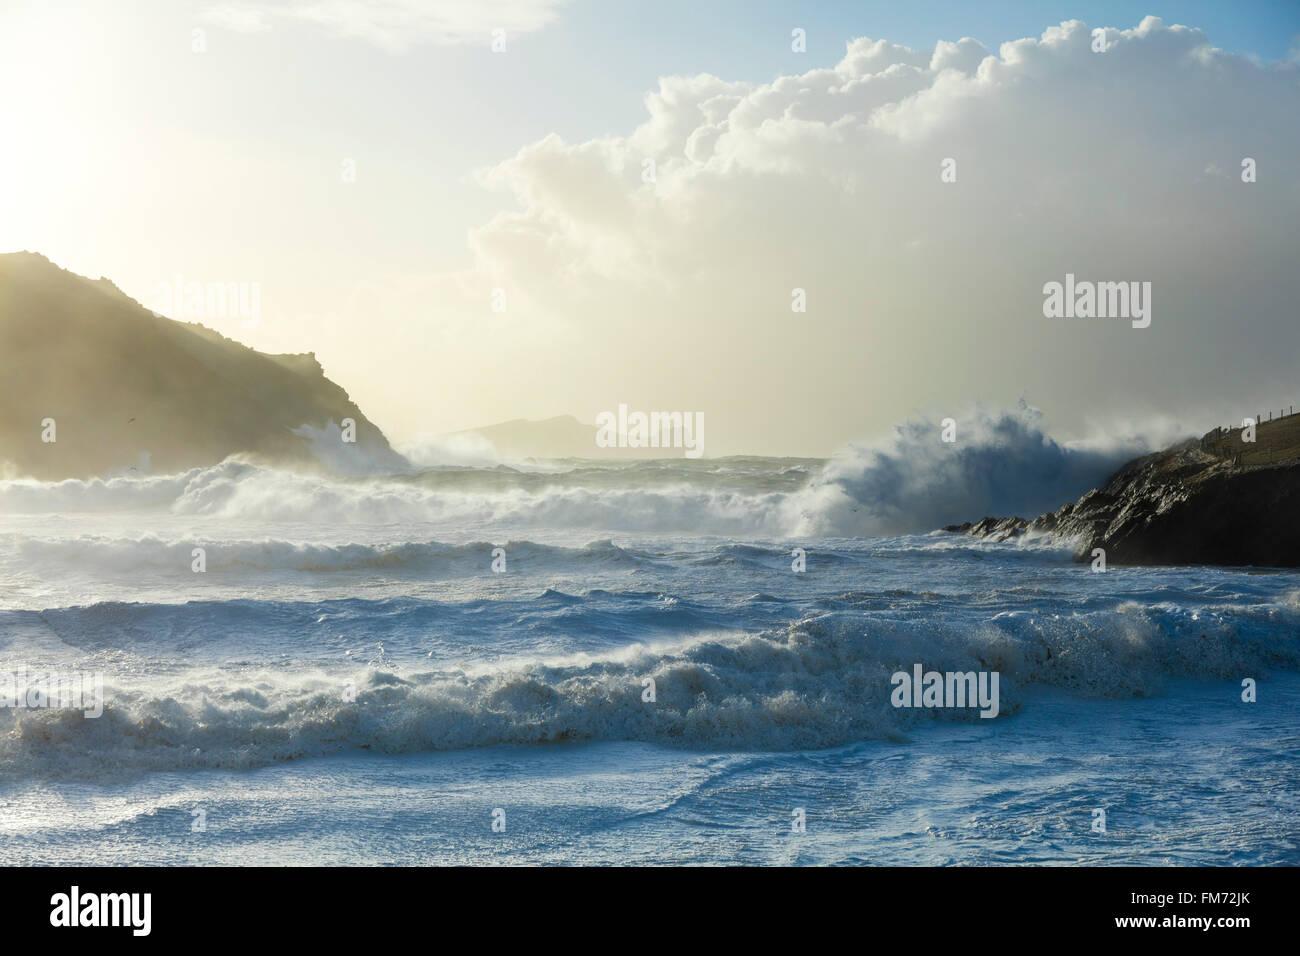 Sturmwellen Einreiten Clogher Bucht, Halbinsel Dingle, County Kerry, Irland. Stockbild